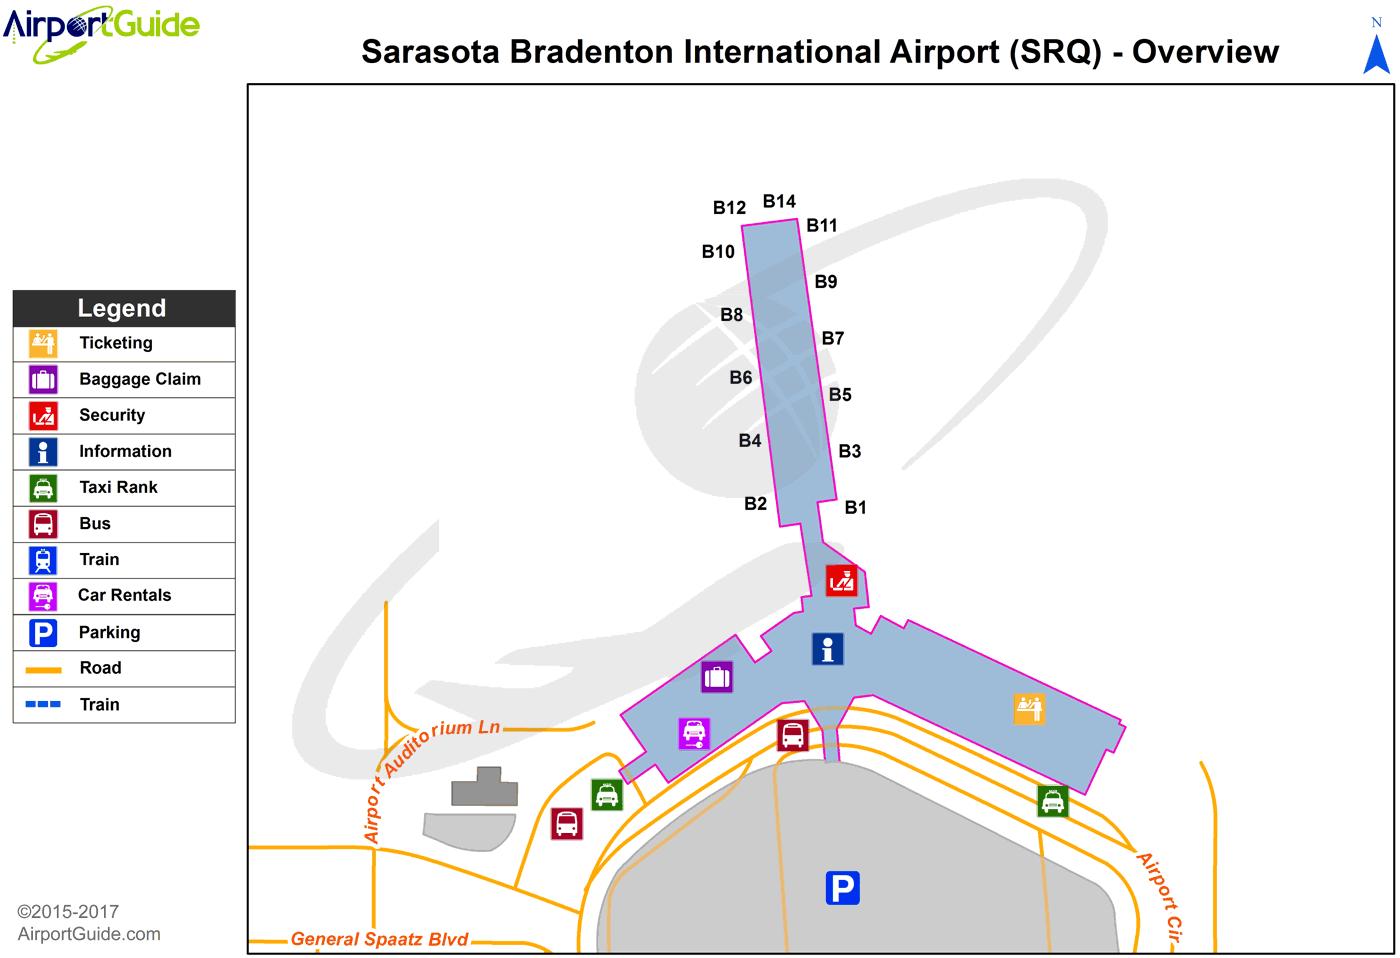 Sarasota/Bradenton Sarasota/Bradenton International (SRQ